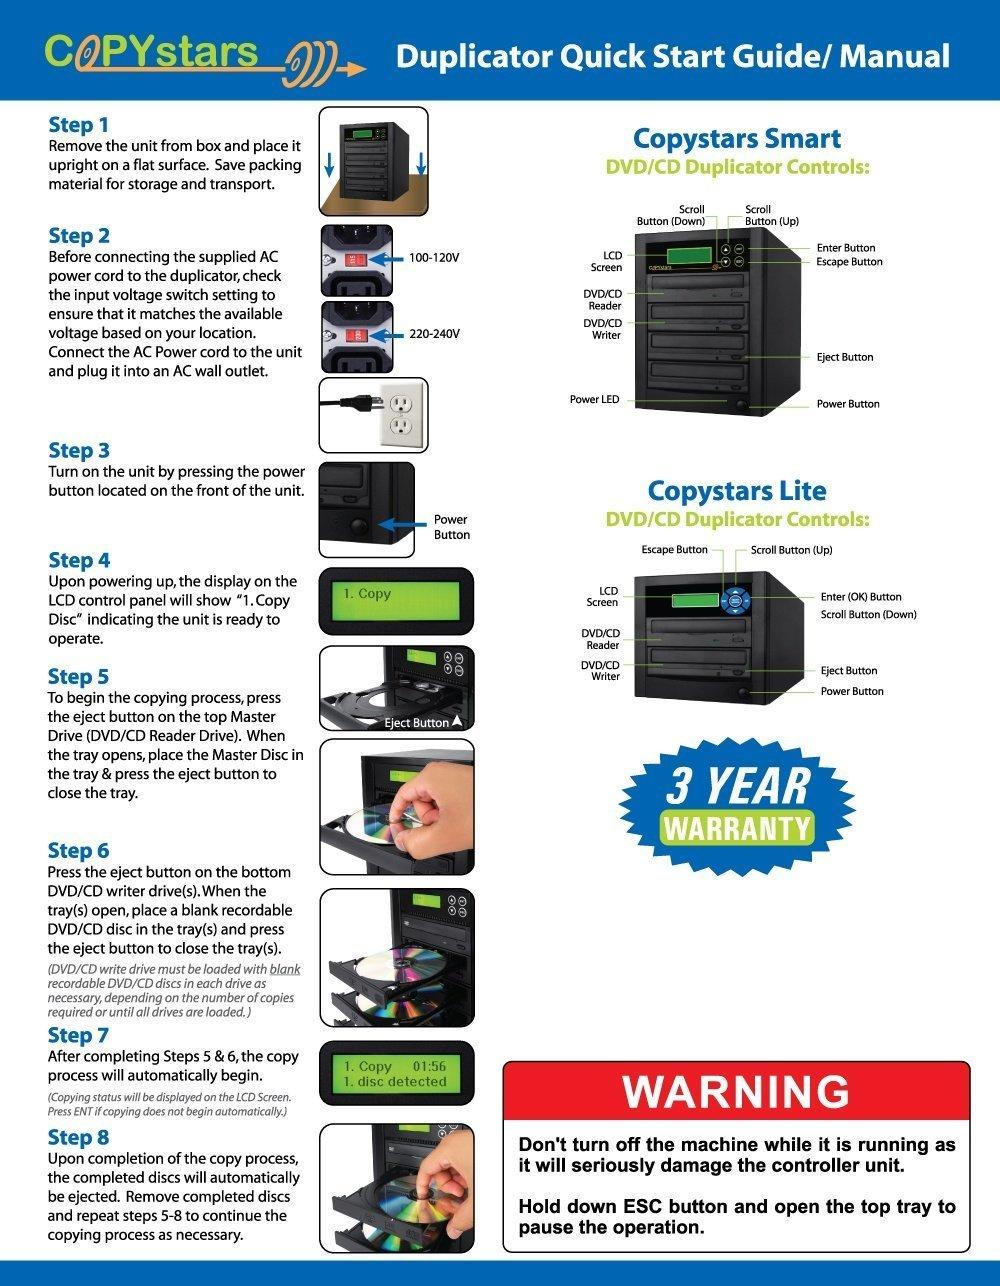 Copystars Blu Ray Duplicator 16X BD-R BDXL CD Dvd Burner Duplicator 1 to 1 Target Tower by Copystars